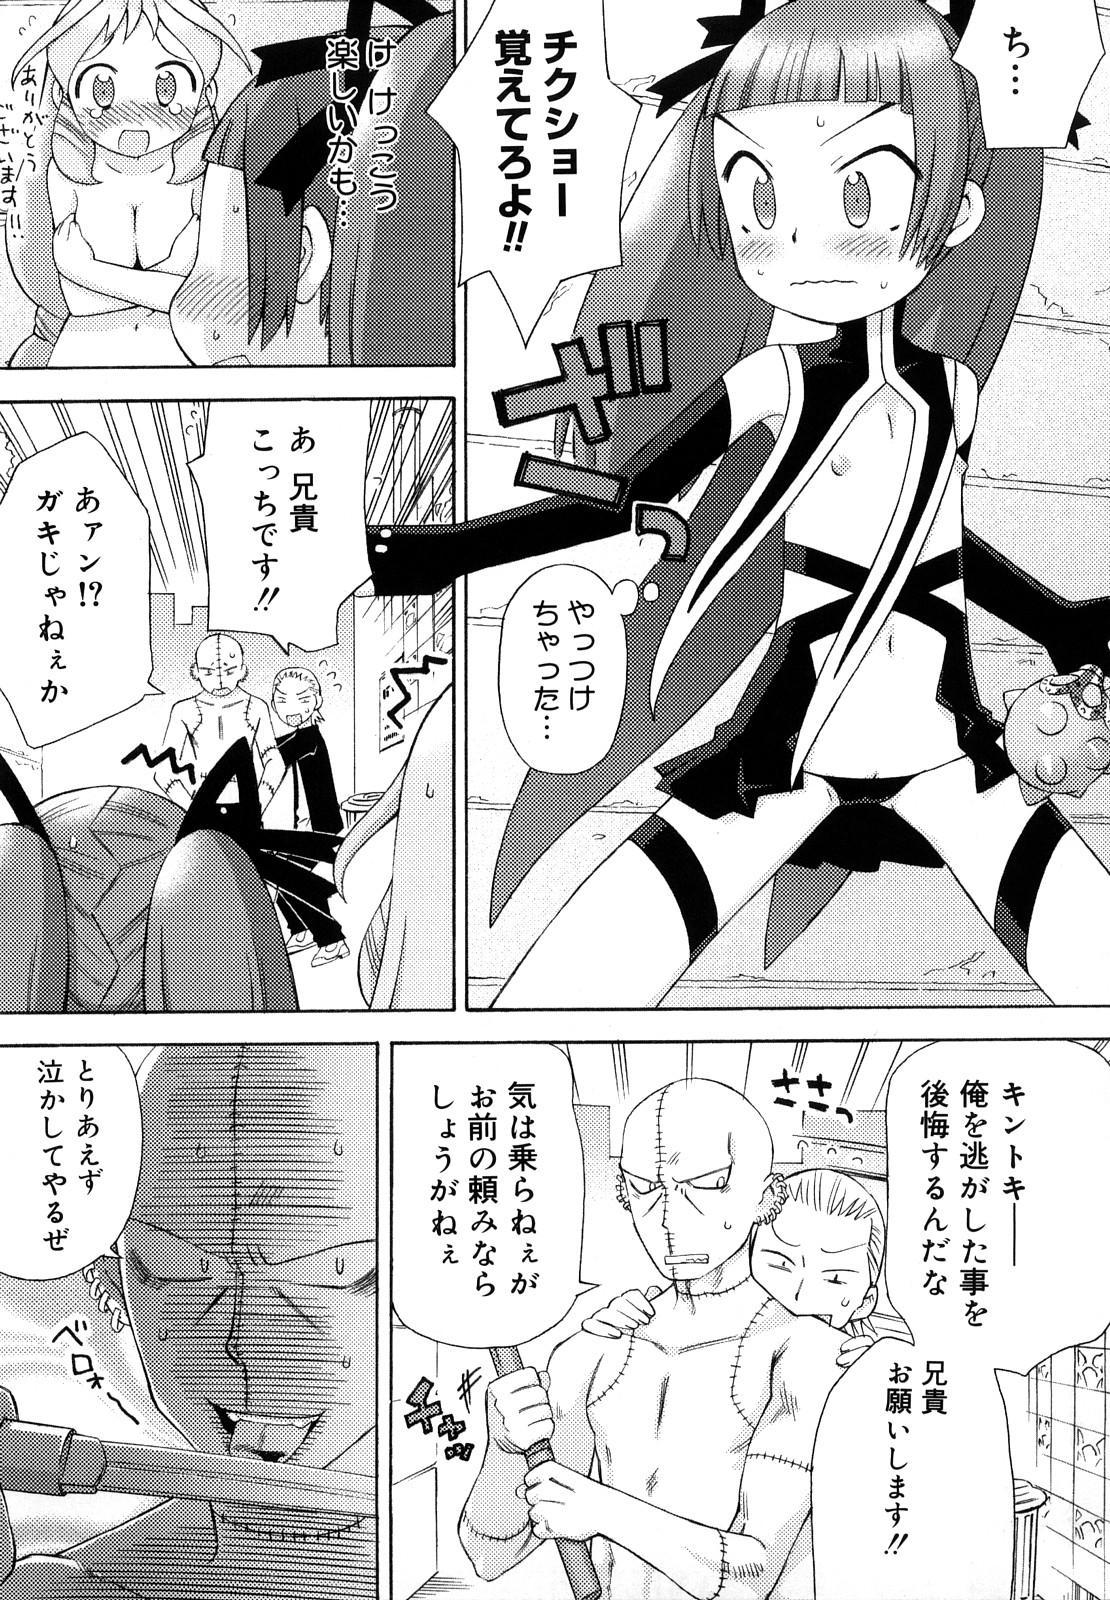 Hatsuden Pandakun! Shinsouban 115